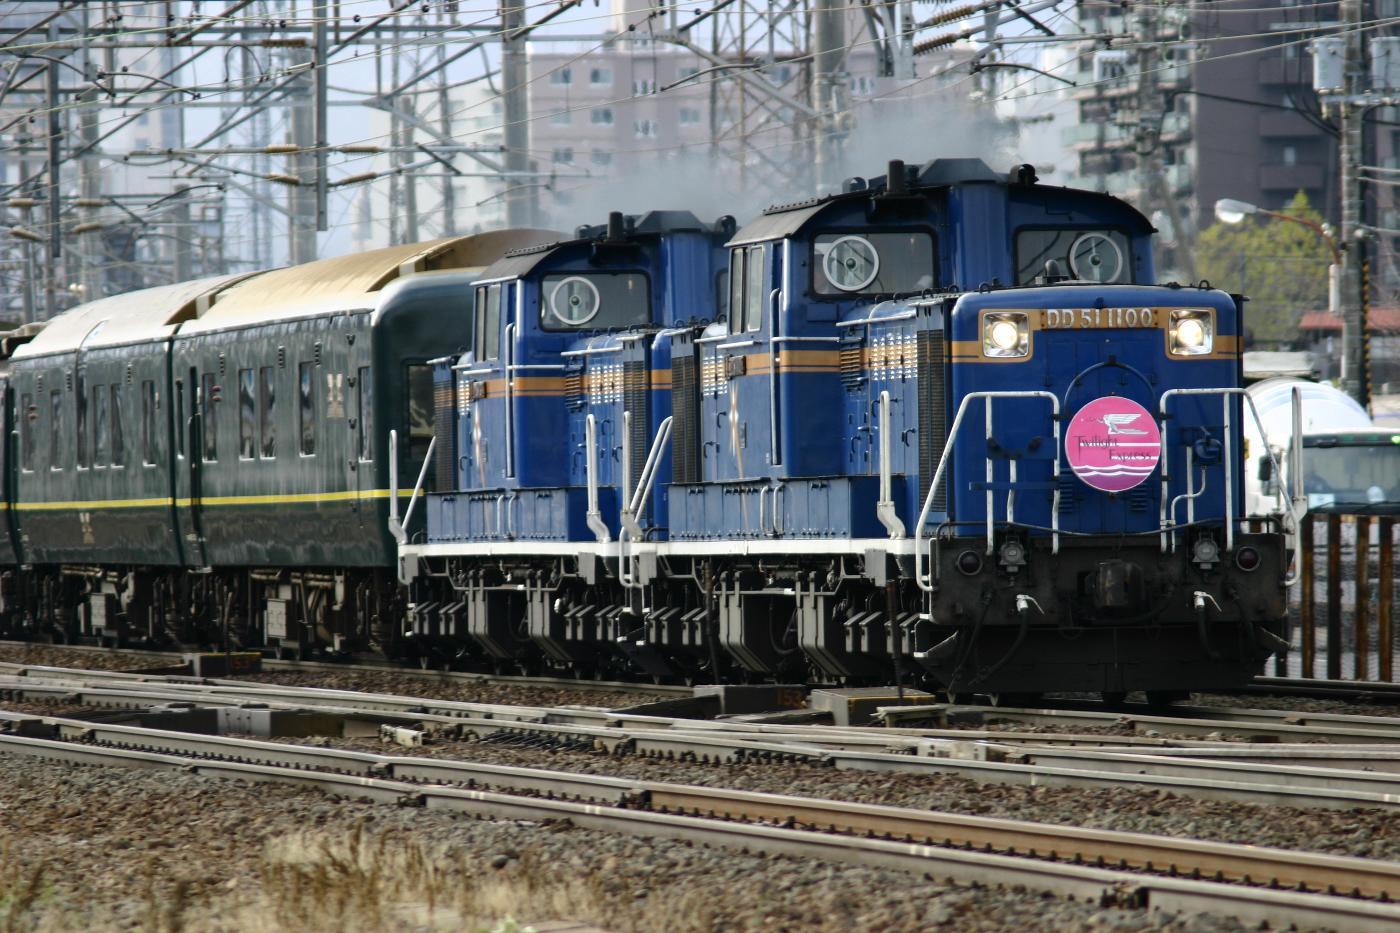 Jr111202001